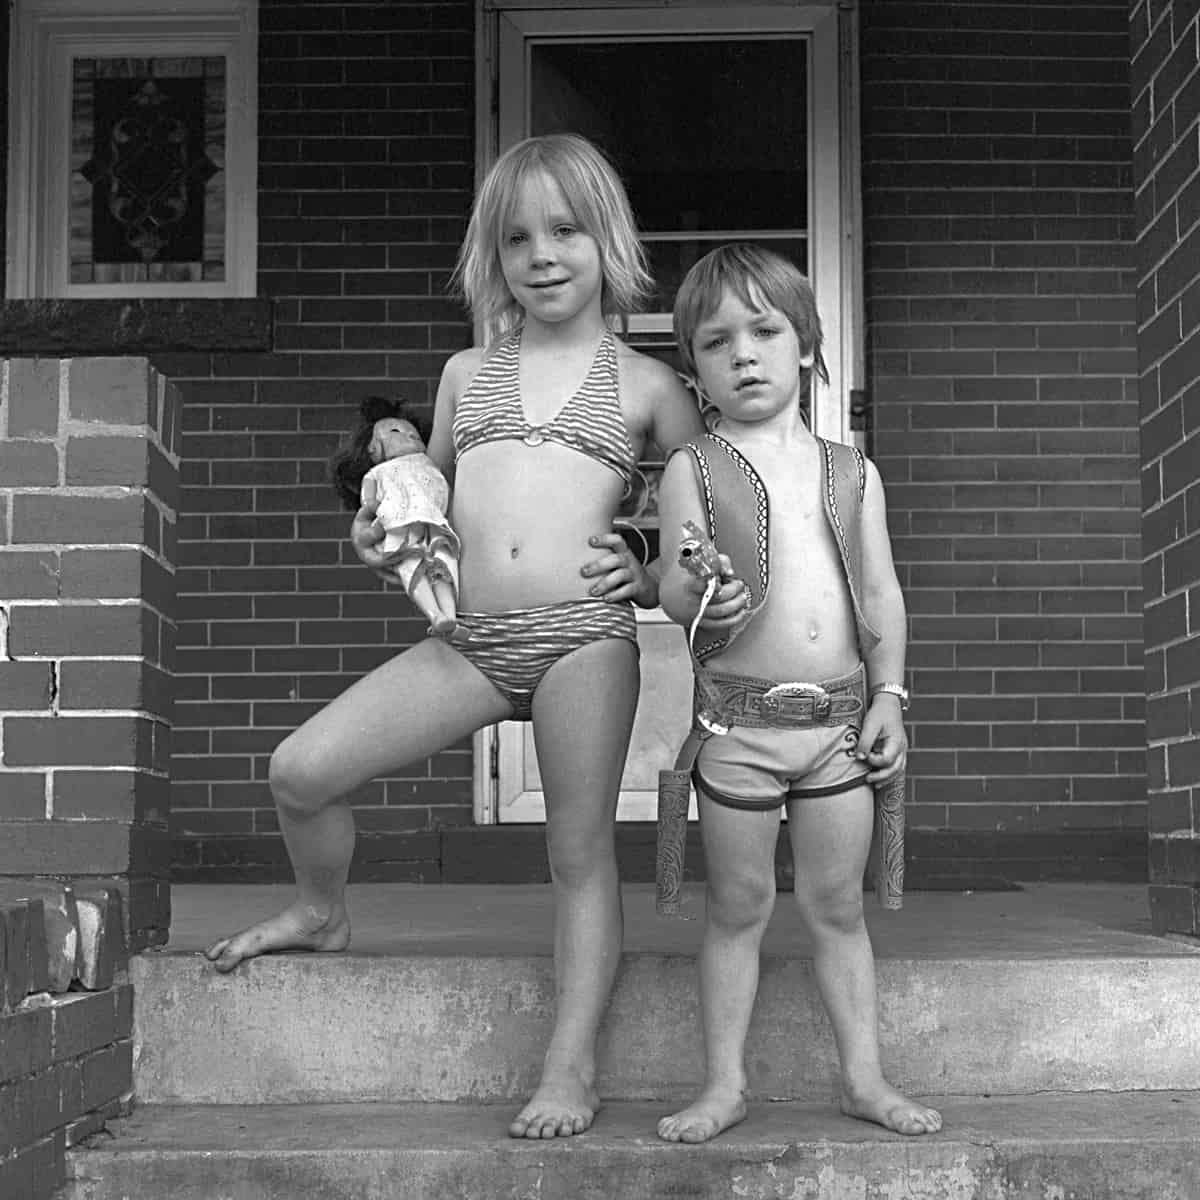 Kimberley & Garrett, Denver, 1978 Photographie ©Ricardo Bloch